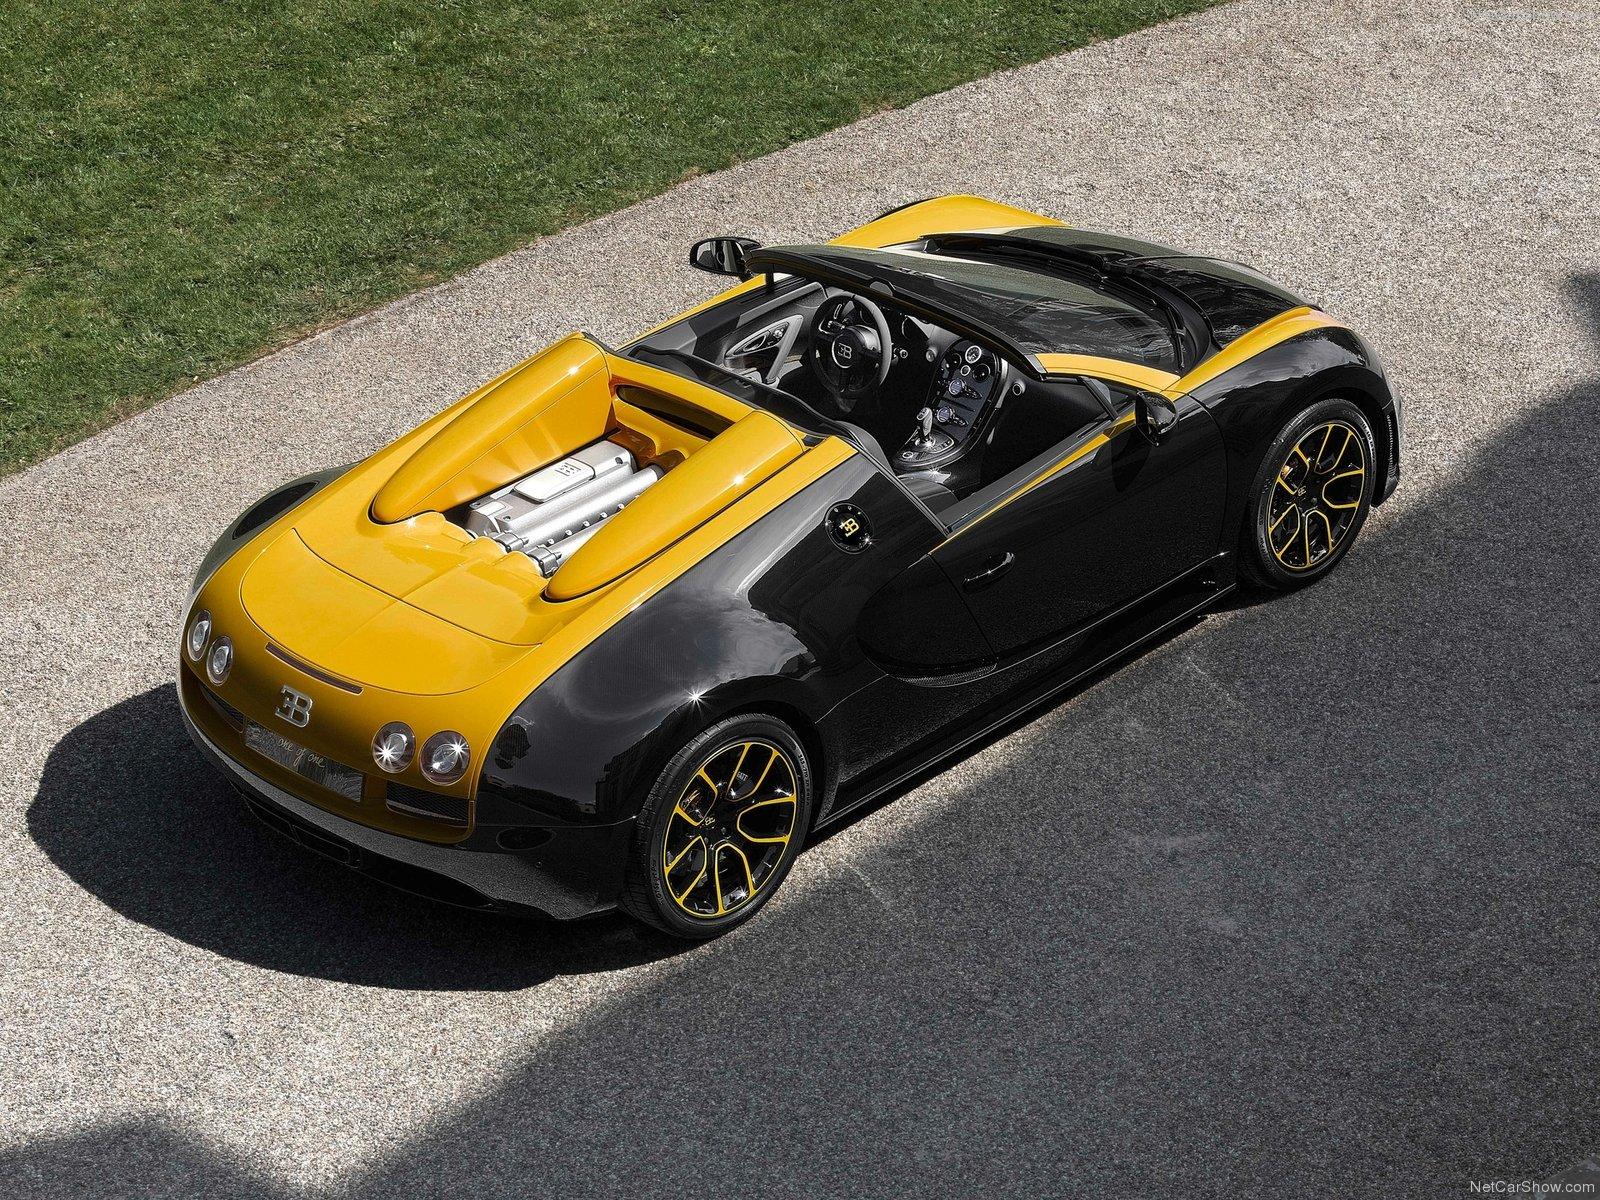 2014%2BBugatti%2BVeyron%2BGrand%2BSport%2BVitesse%2B1of1%2B%25282%2529 Astounding Xe Bugatti Veyron Grand Sport Vitesse Cars Trend